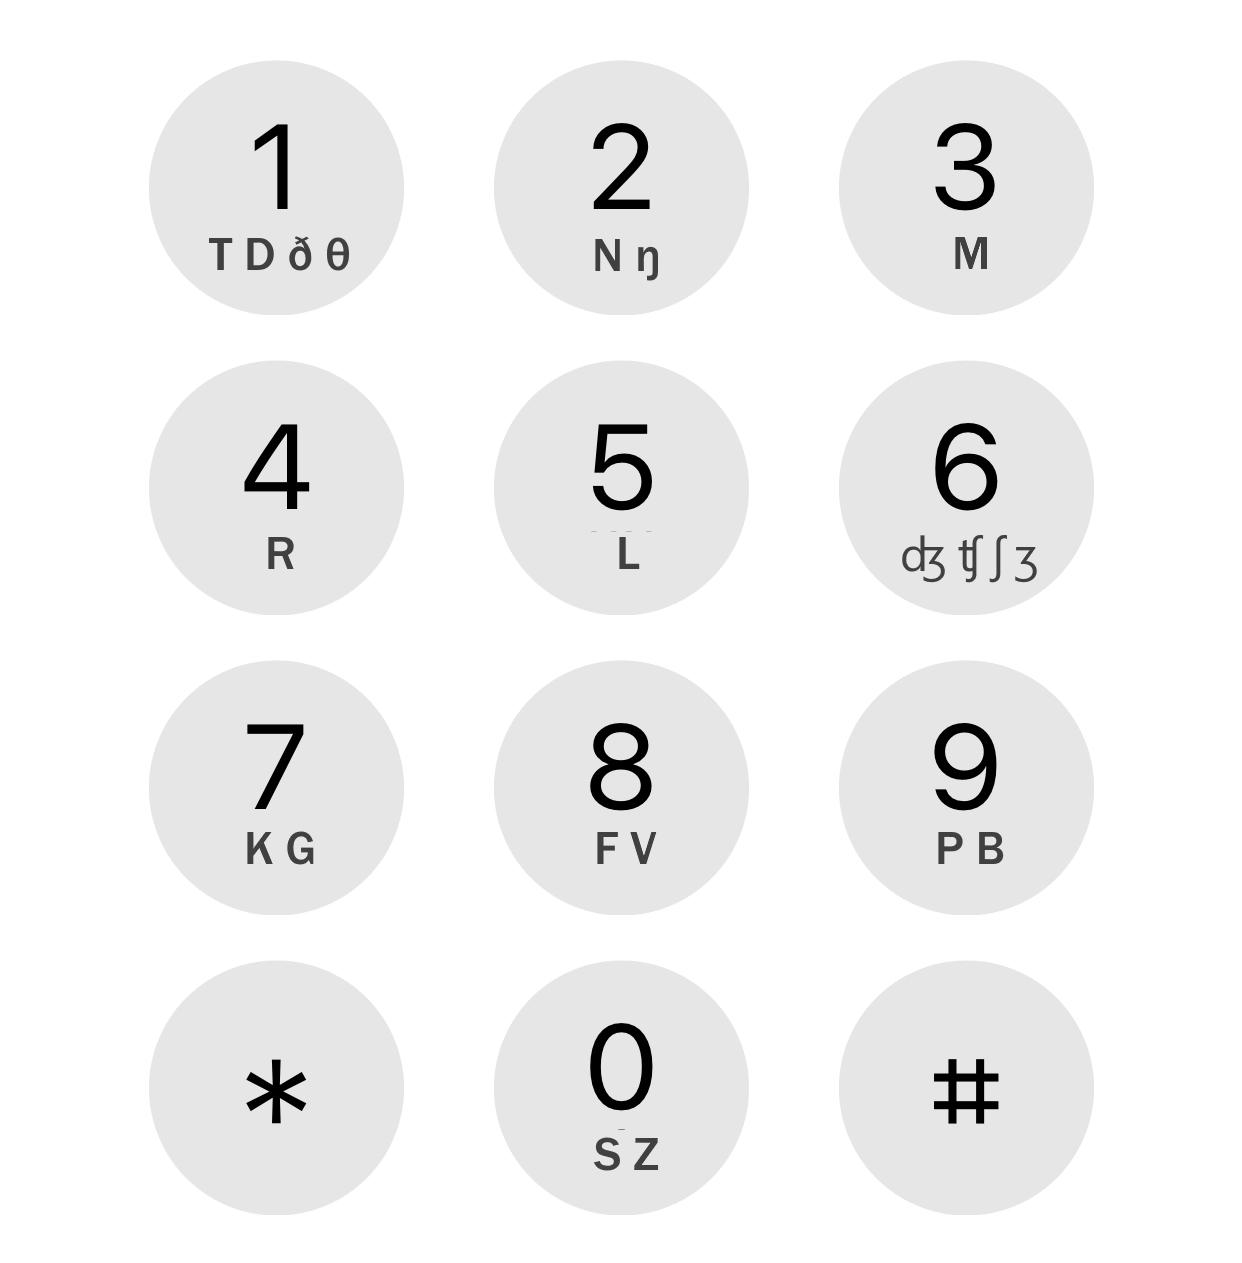 0: S Z, 1: T D ð θ, 2: N ŋ, 3: M, 4: R, 5: L, 6: ʤ ʧ ʃ ʒ, 7: K G, 8: F V, 9: P B